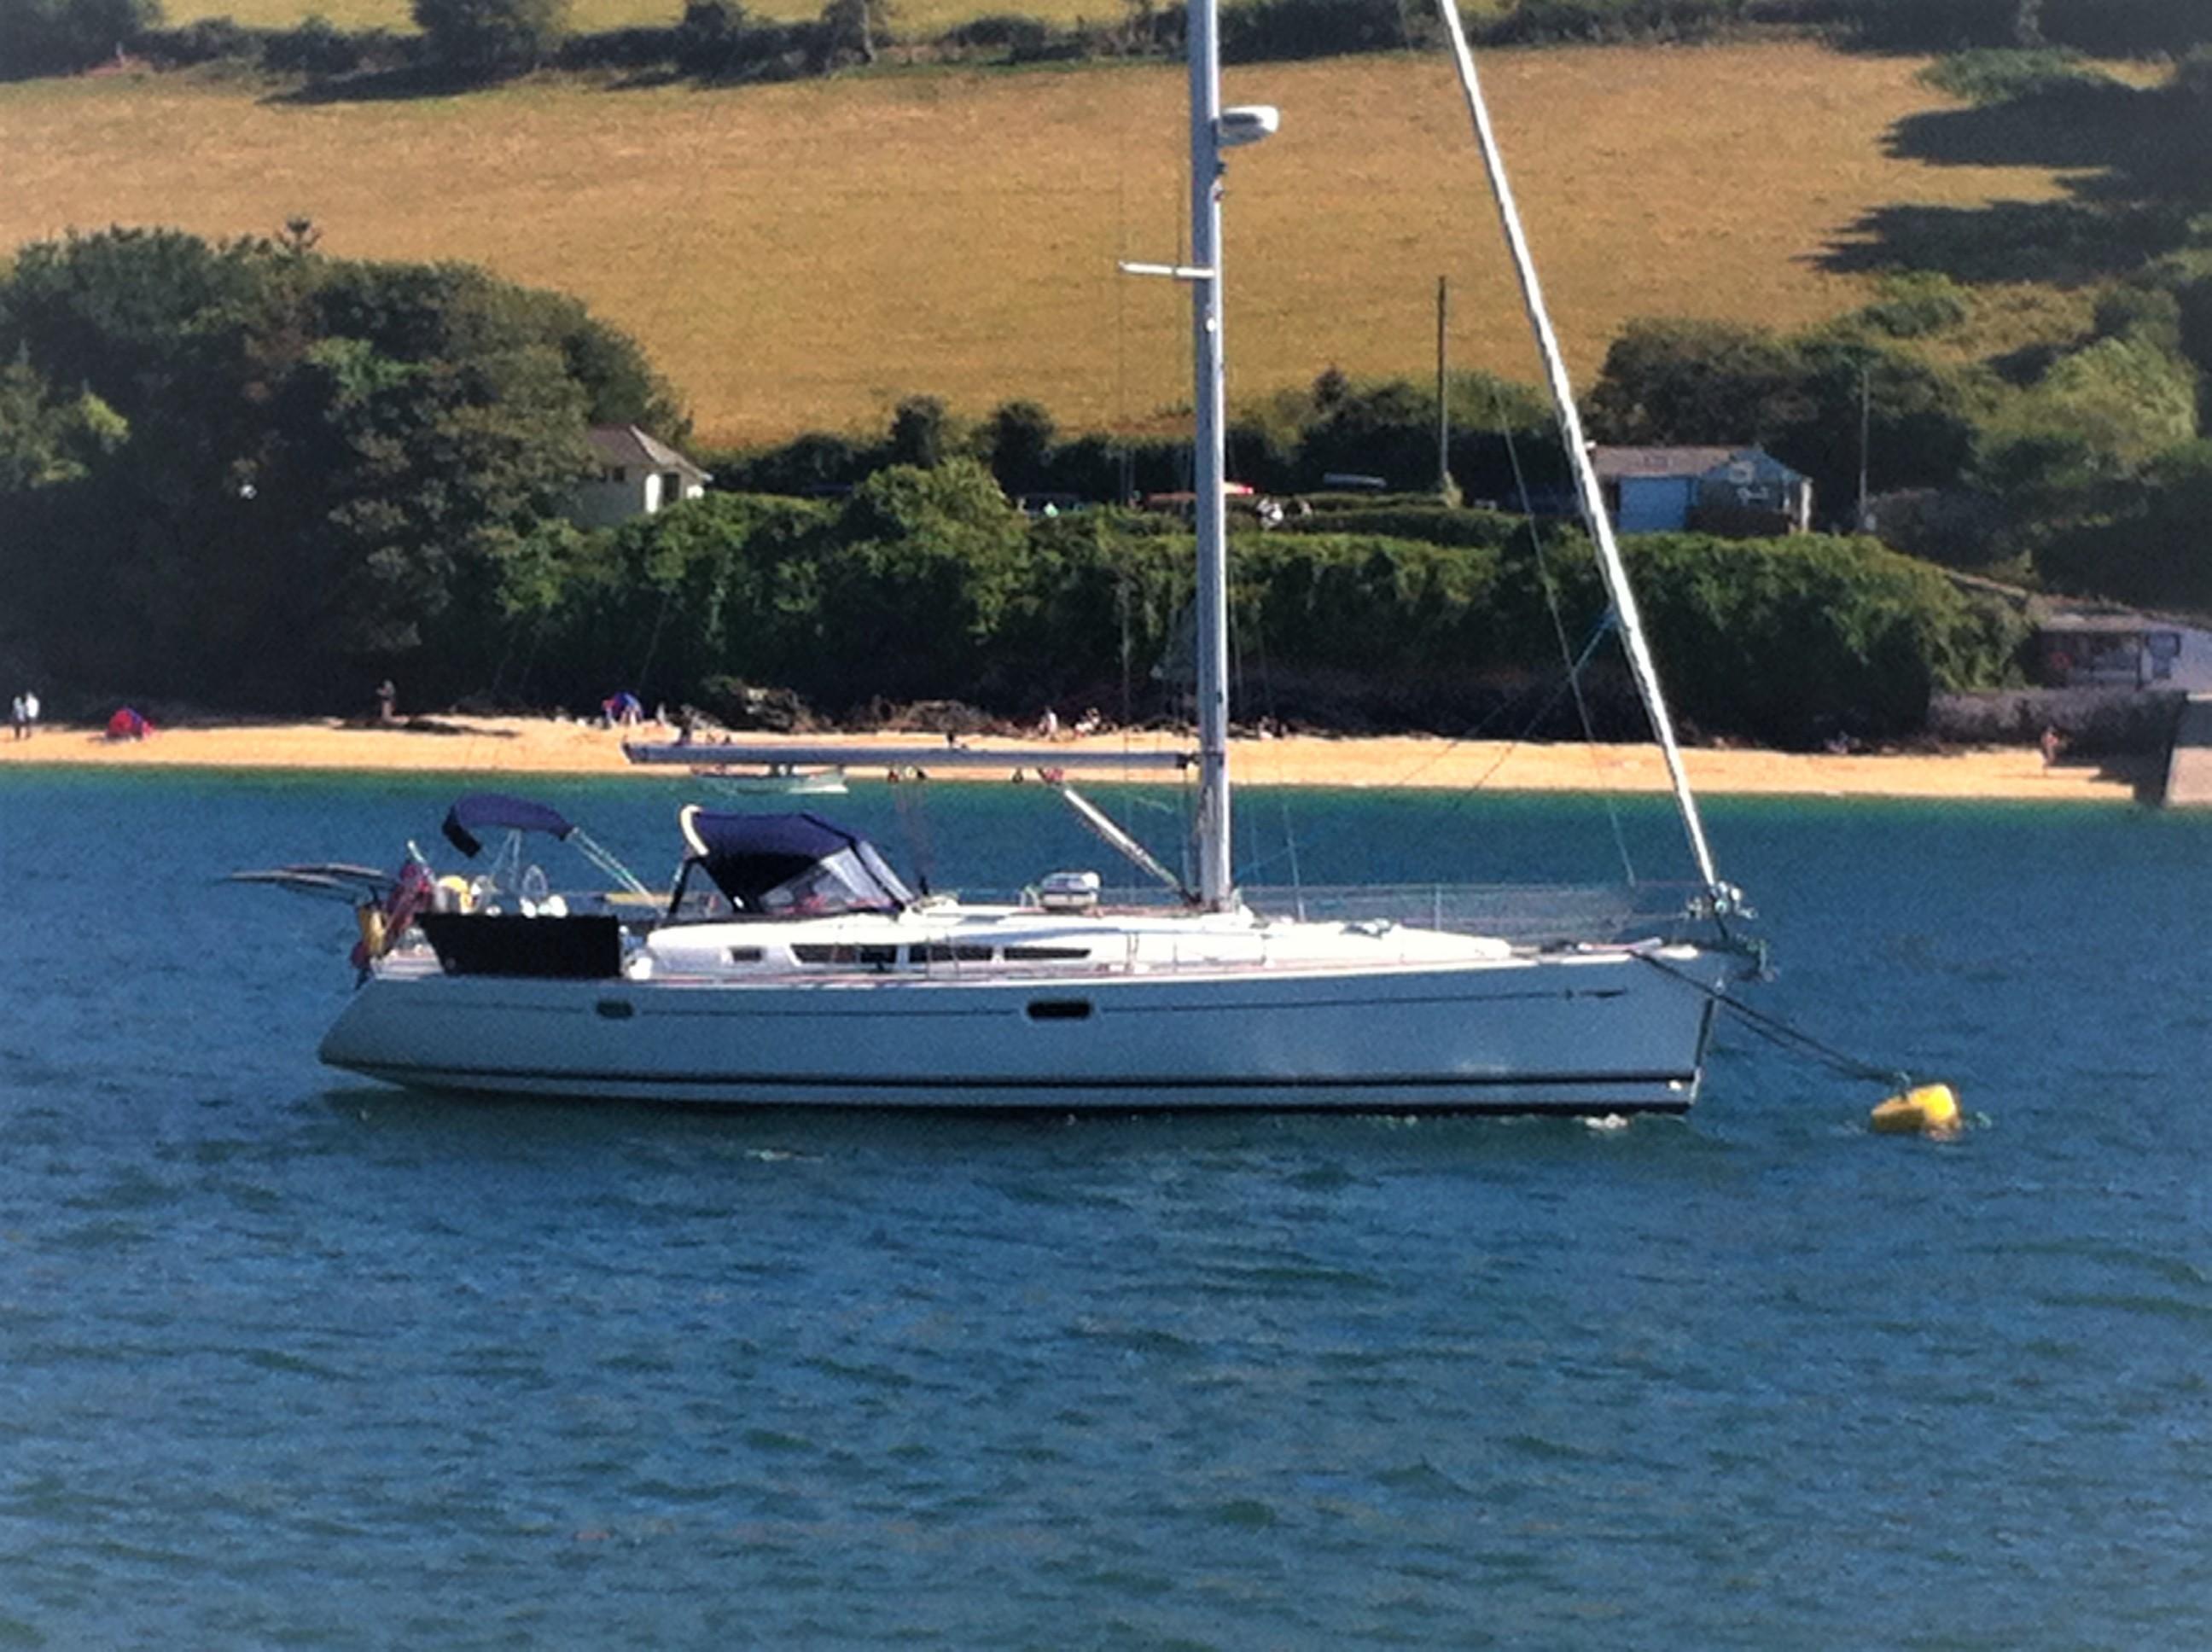 Jeanneau Sun Odyssey 45 Jeanneau-Sun-Odyssey-45.jpg